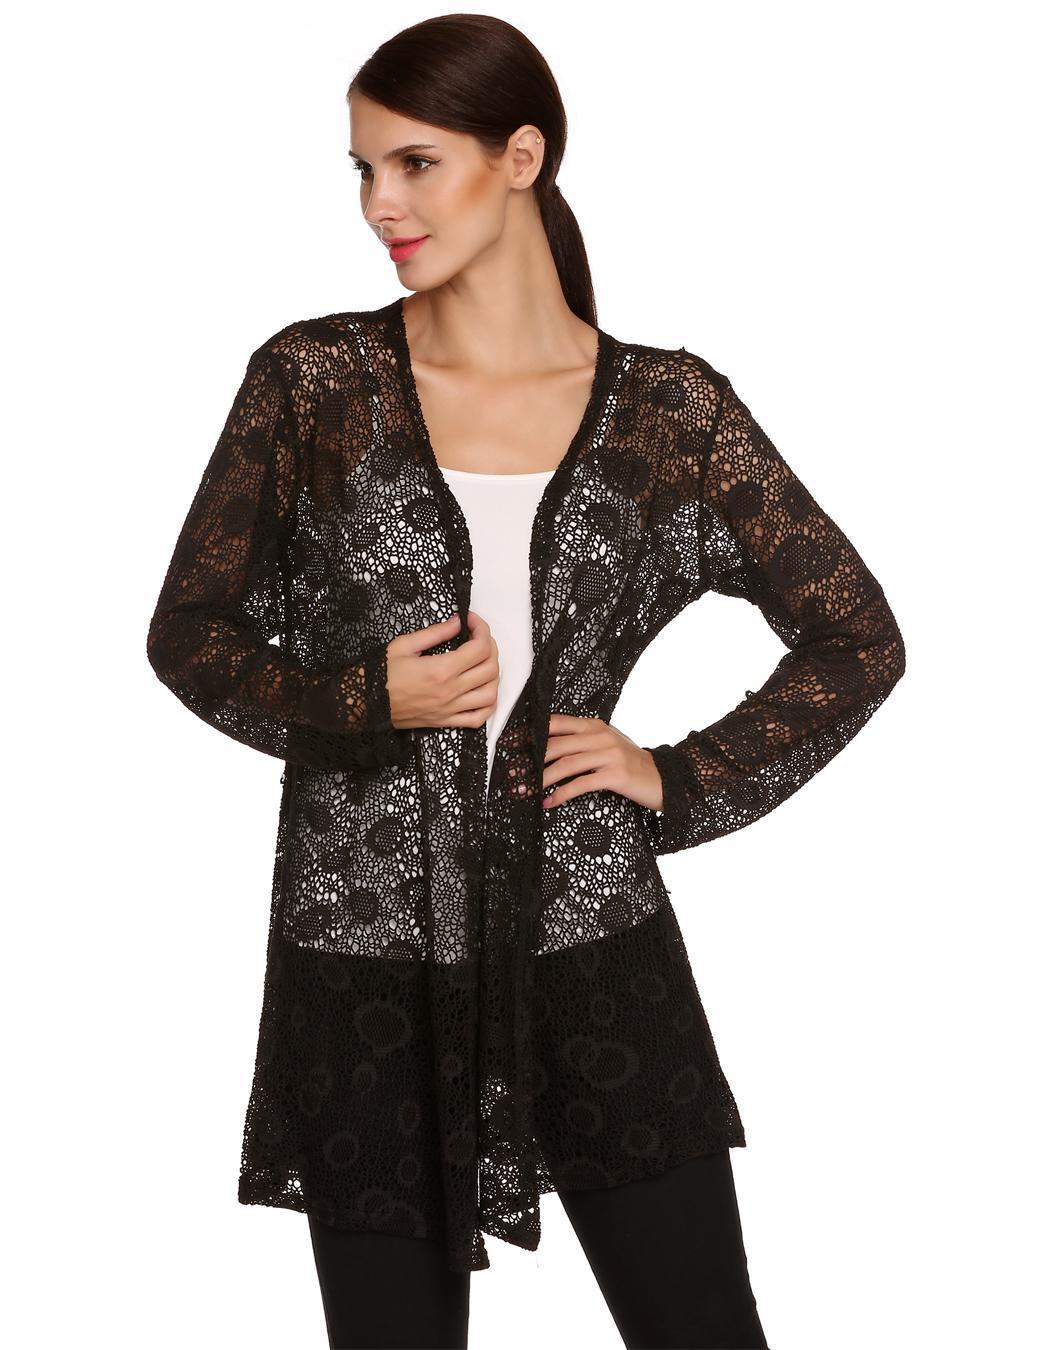 Women Long Sleeve Hollow Out Crochet Long Cardigan Tops 0